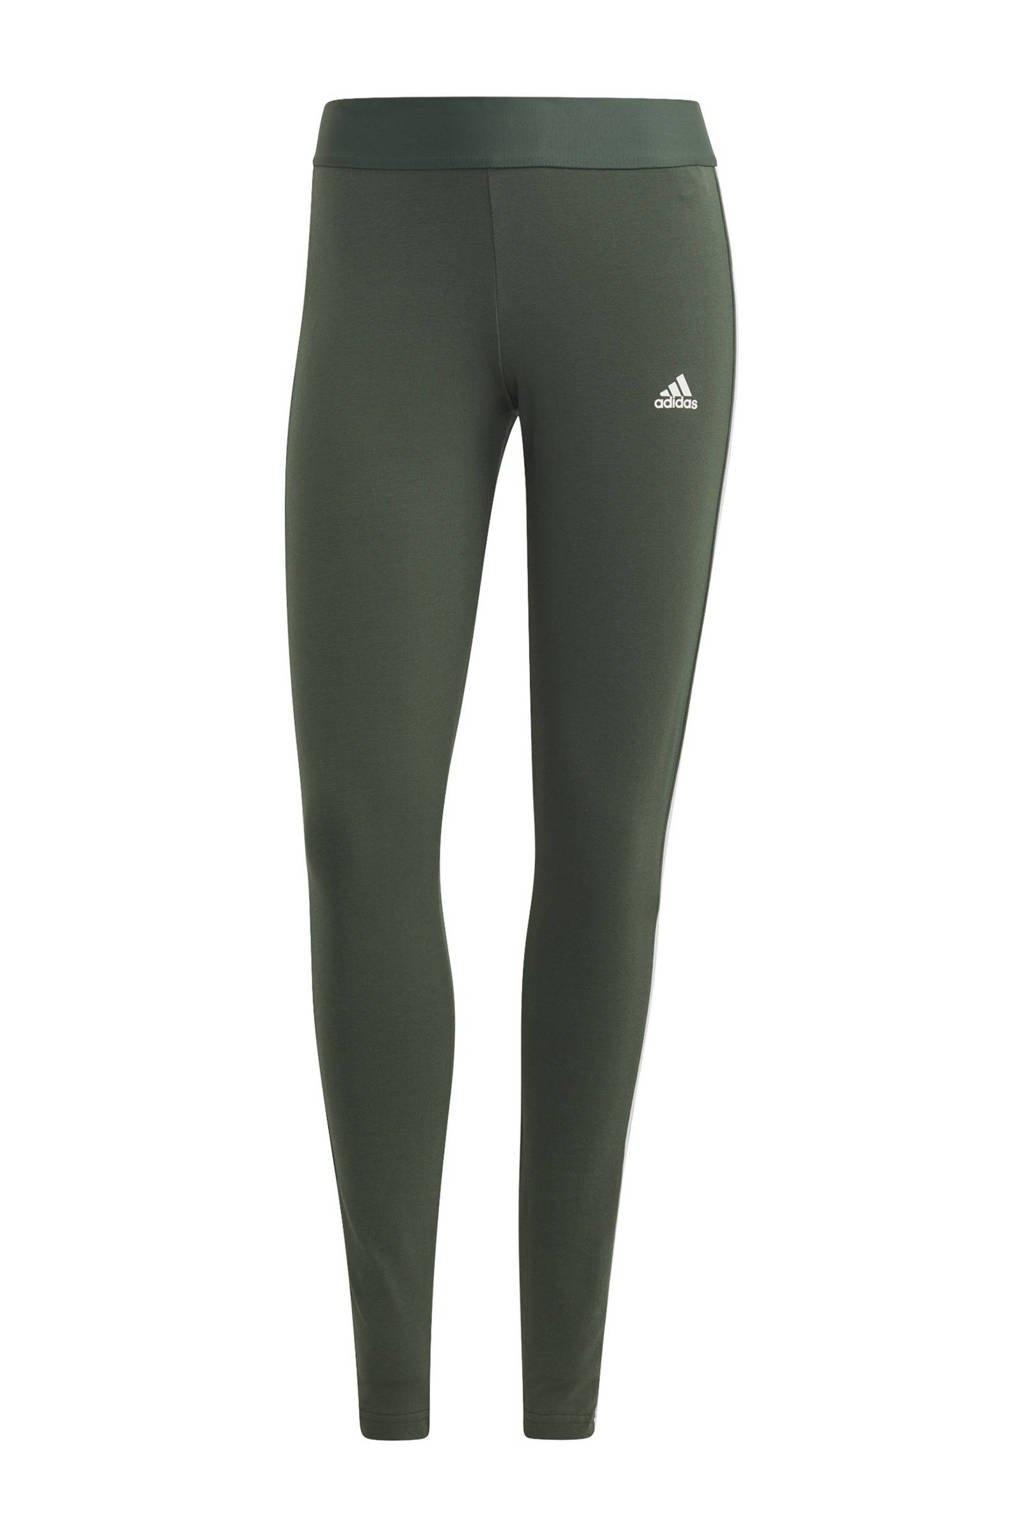 adidas Performance sportlegging groen/wit, Groen/wit